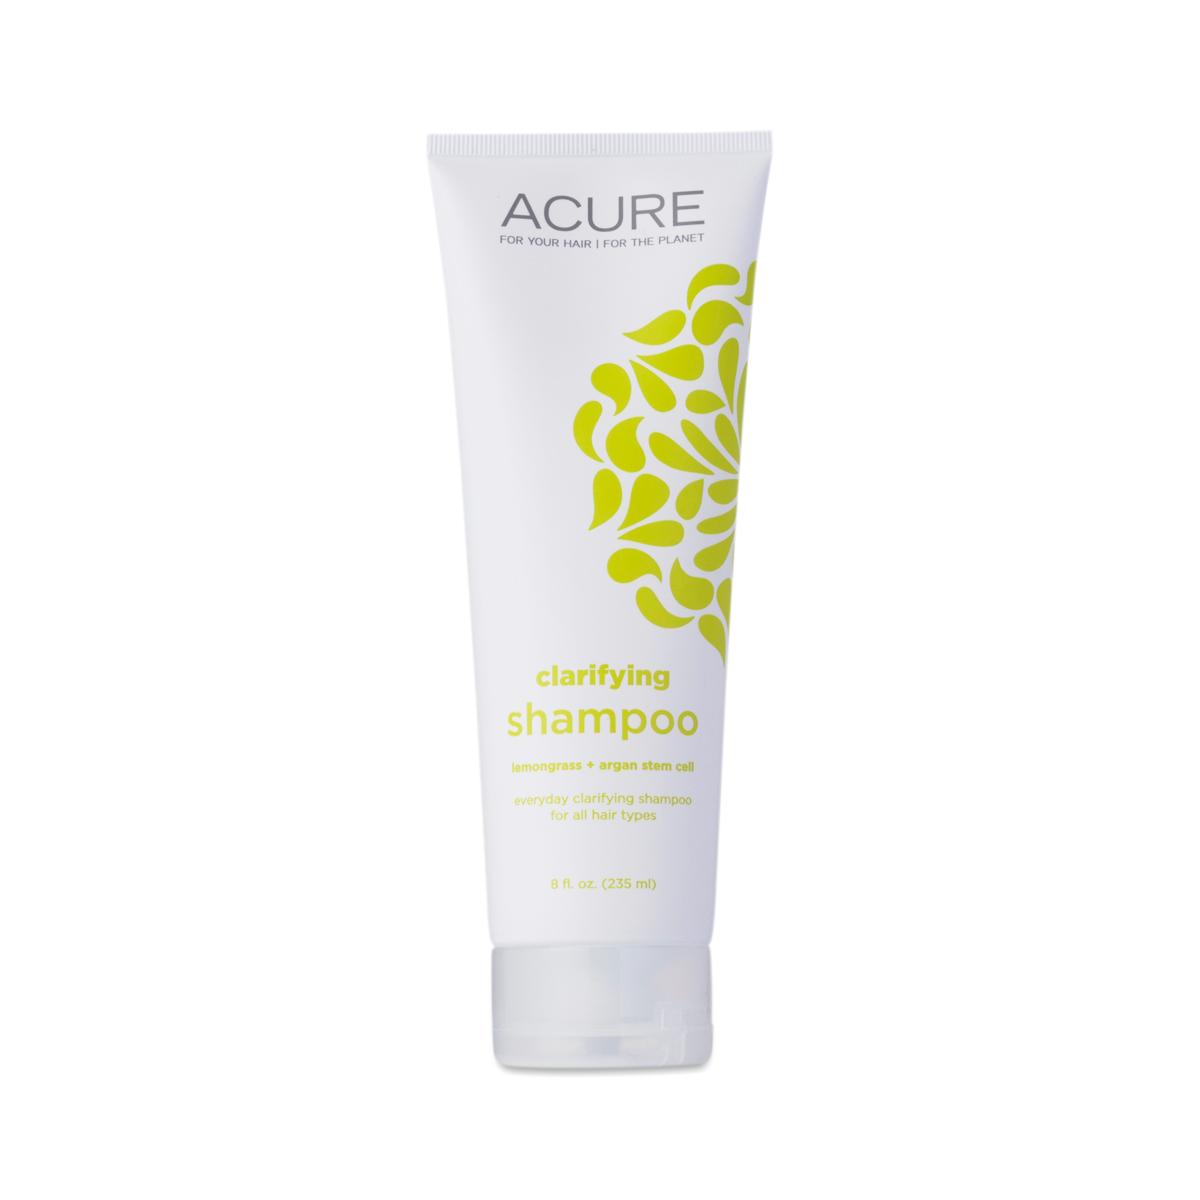 Lemongrass & Argan Stem Cell Shampoo By Acure Organics